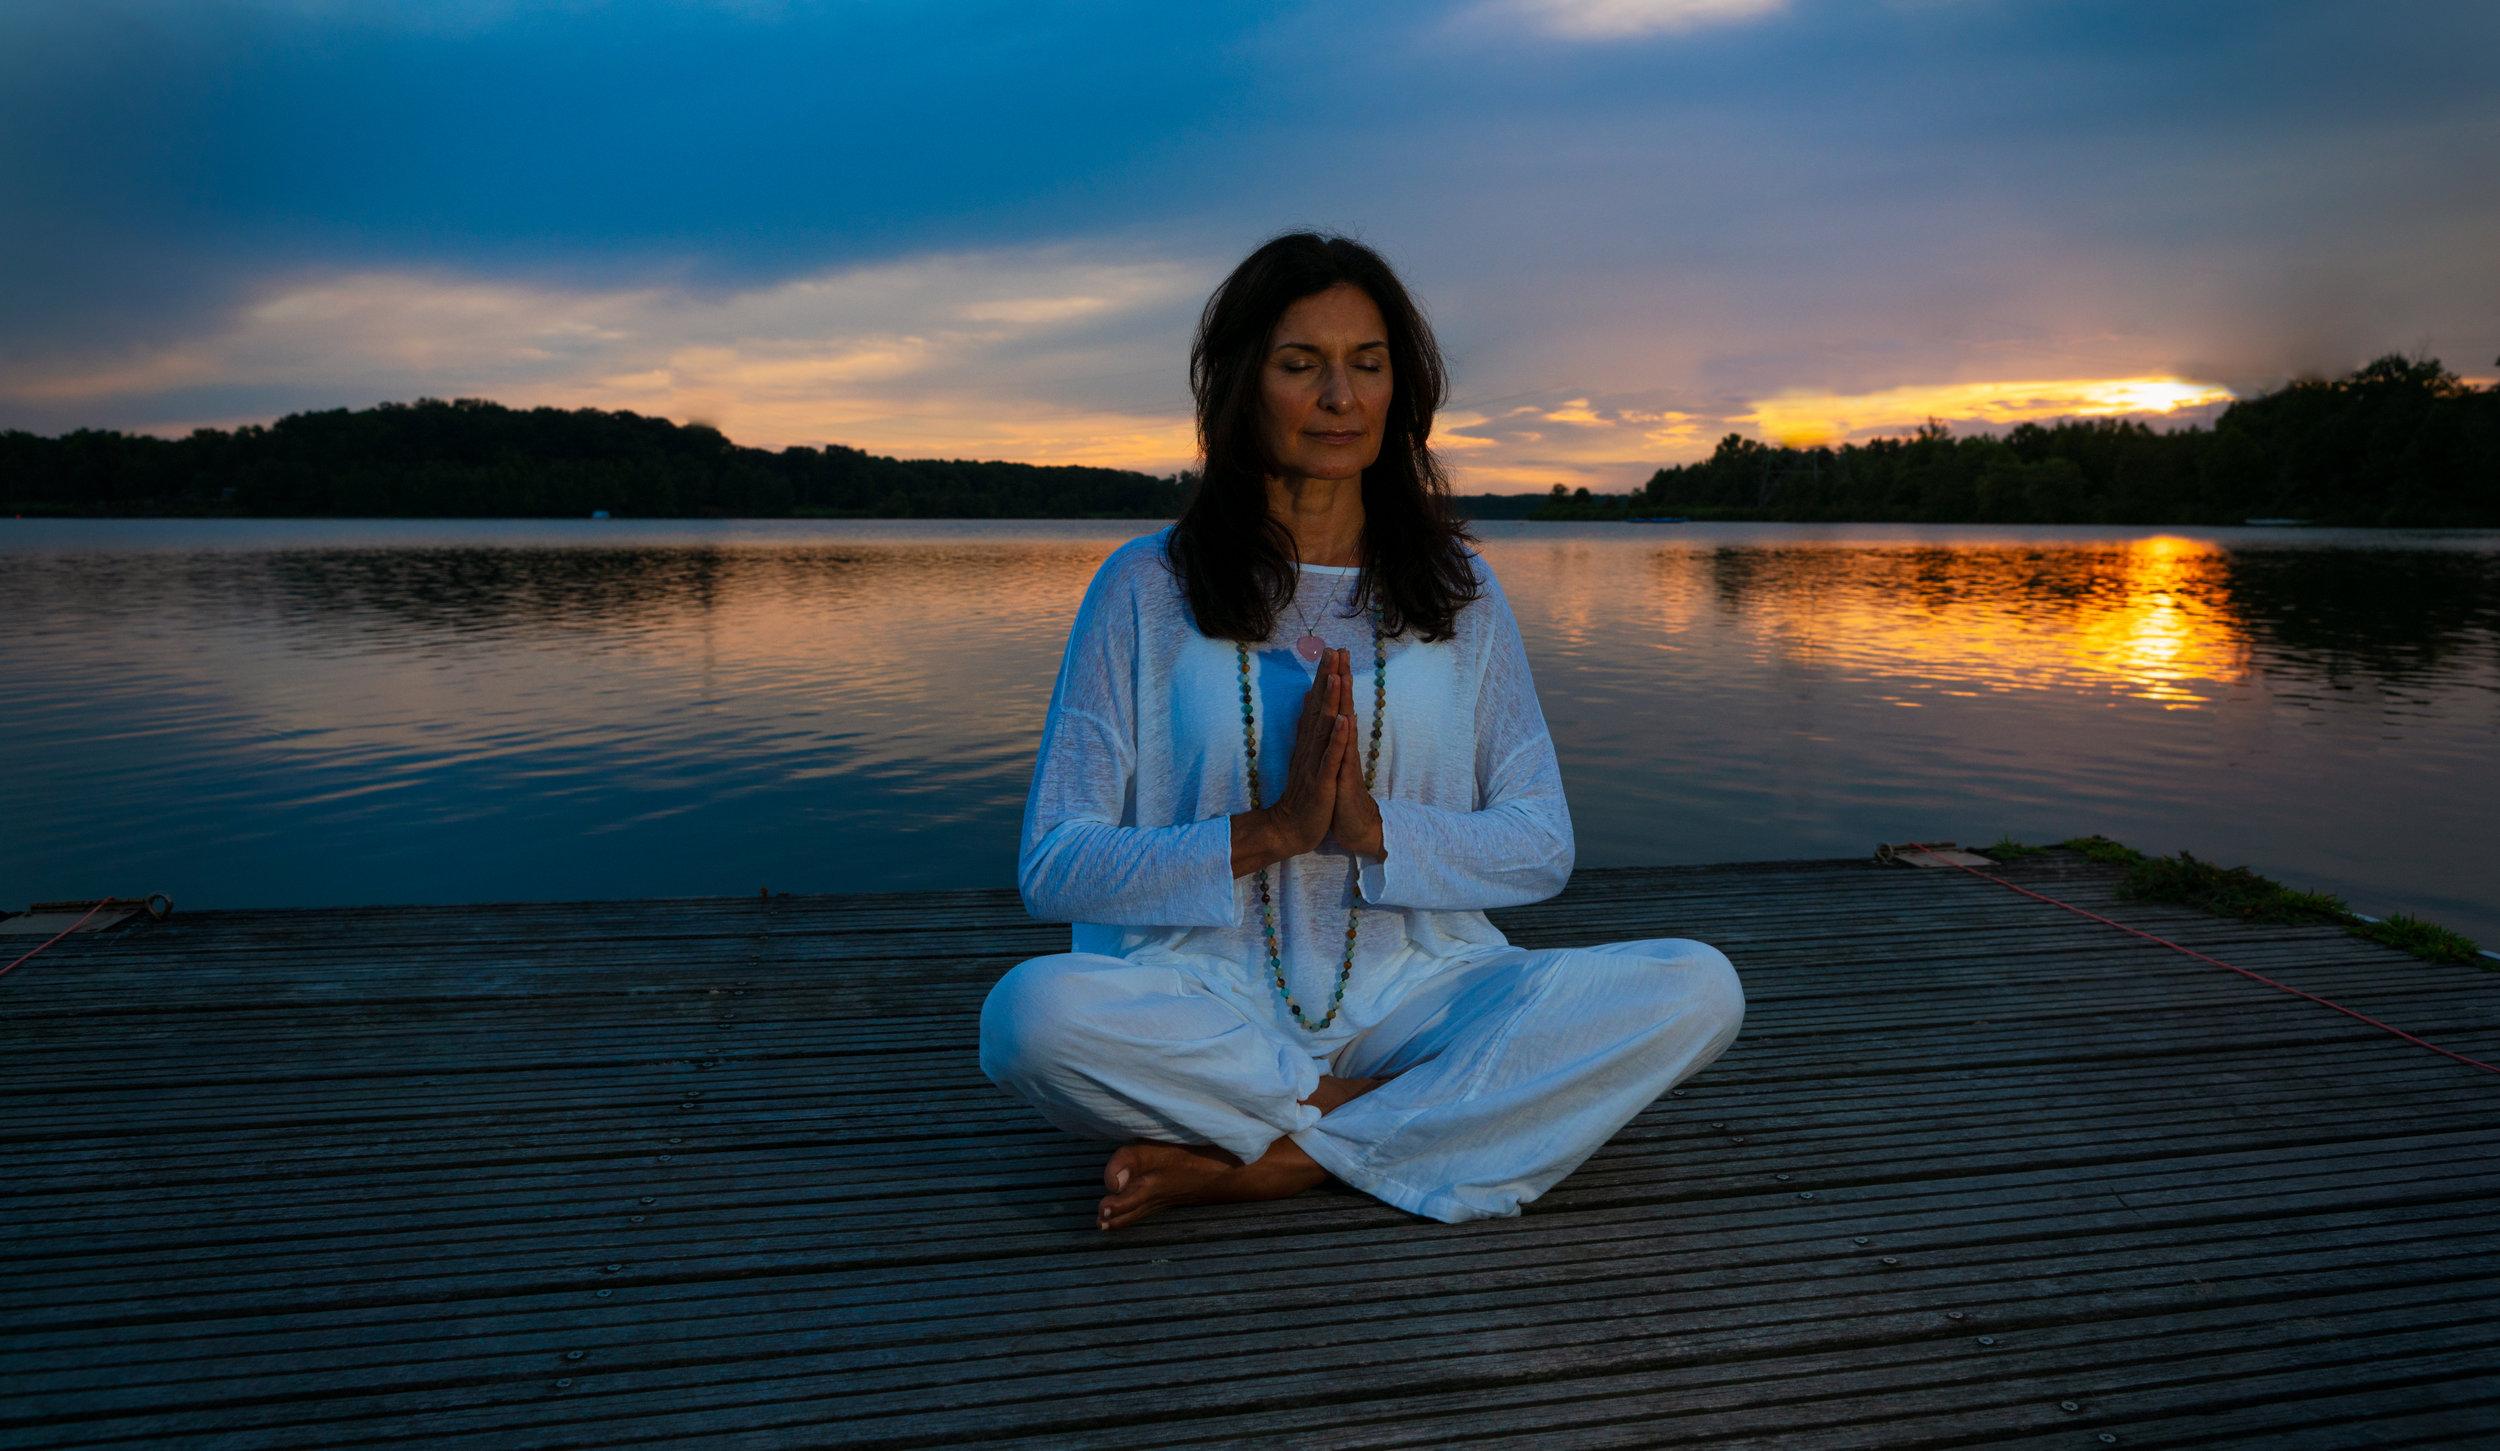 Sunset-Yoga-Portrait.jpg